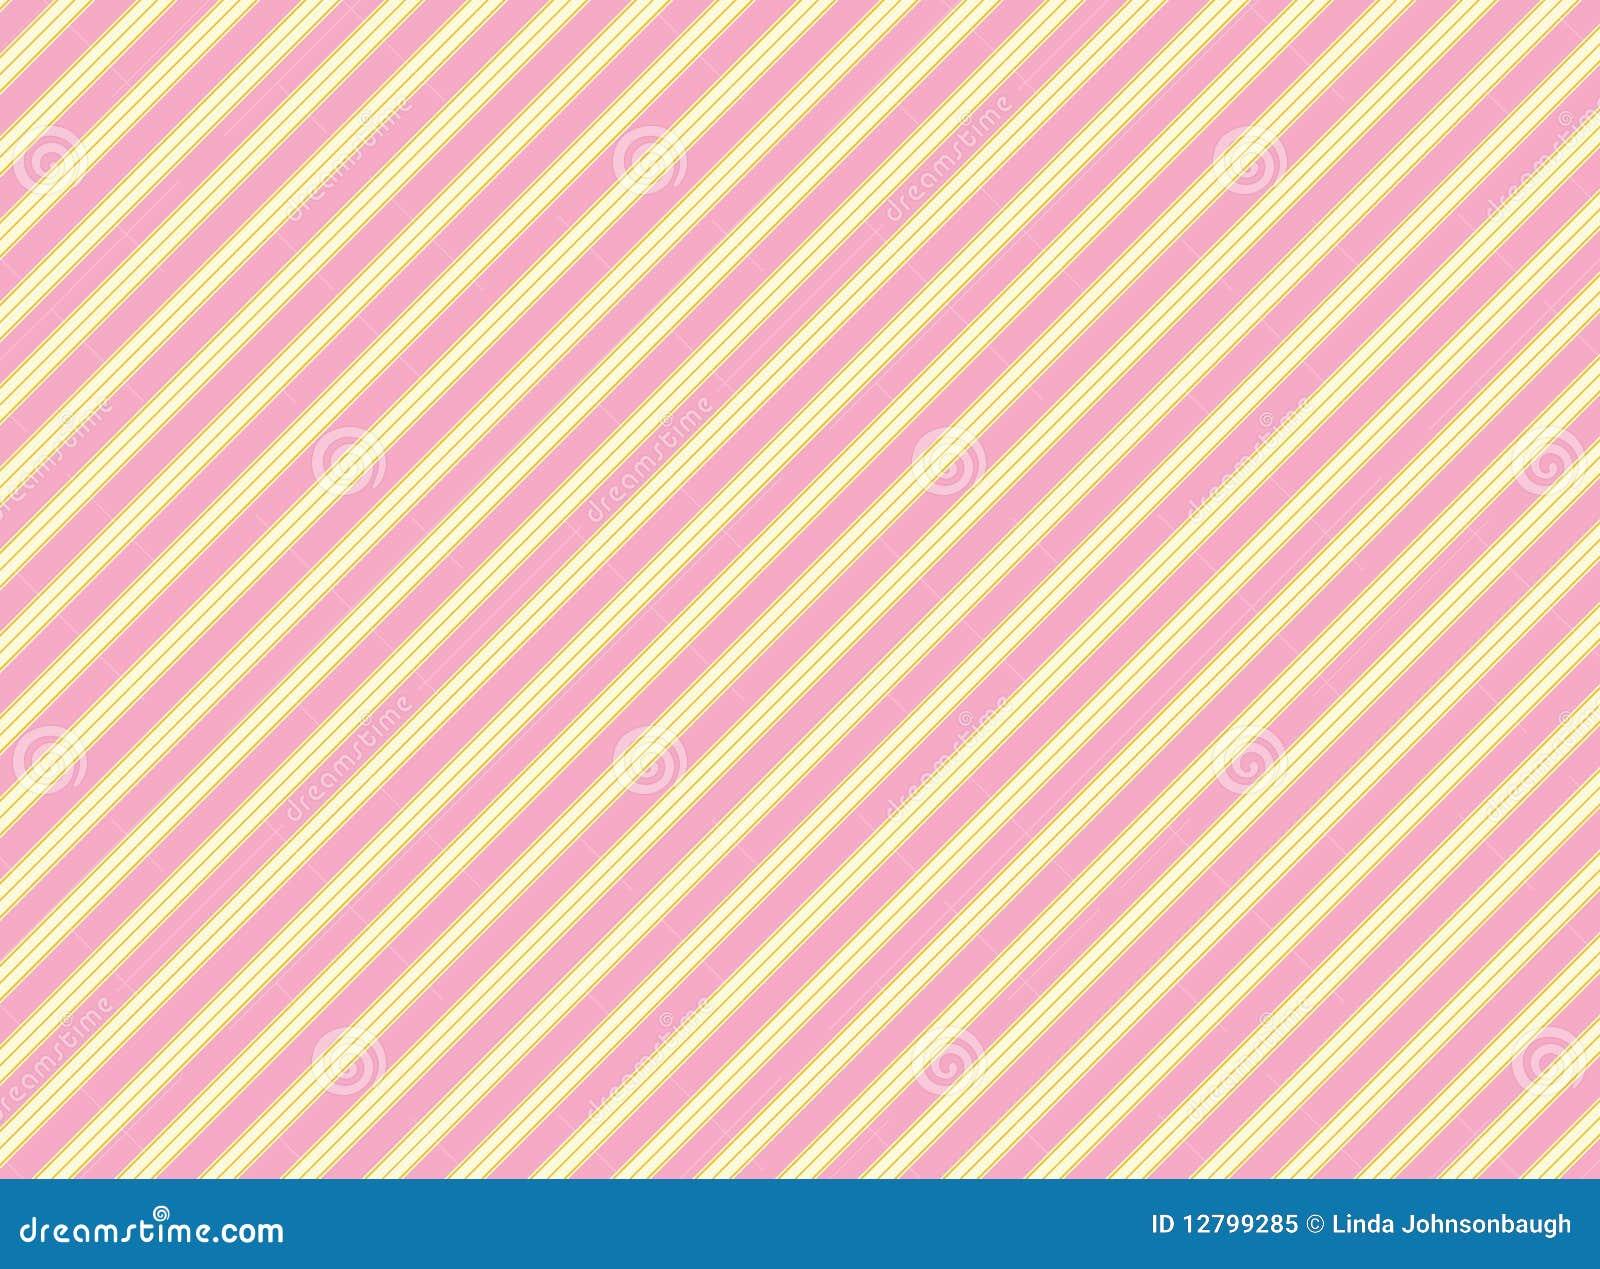 ... Striped Fabric Background Royalty Free Stock Photo - Image: 12799285